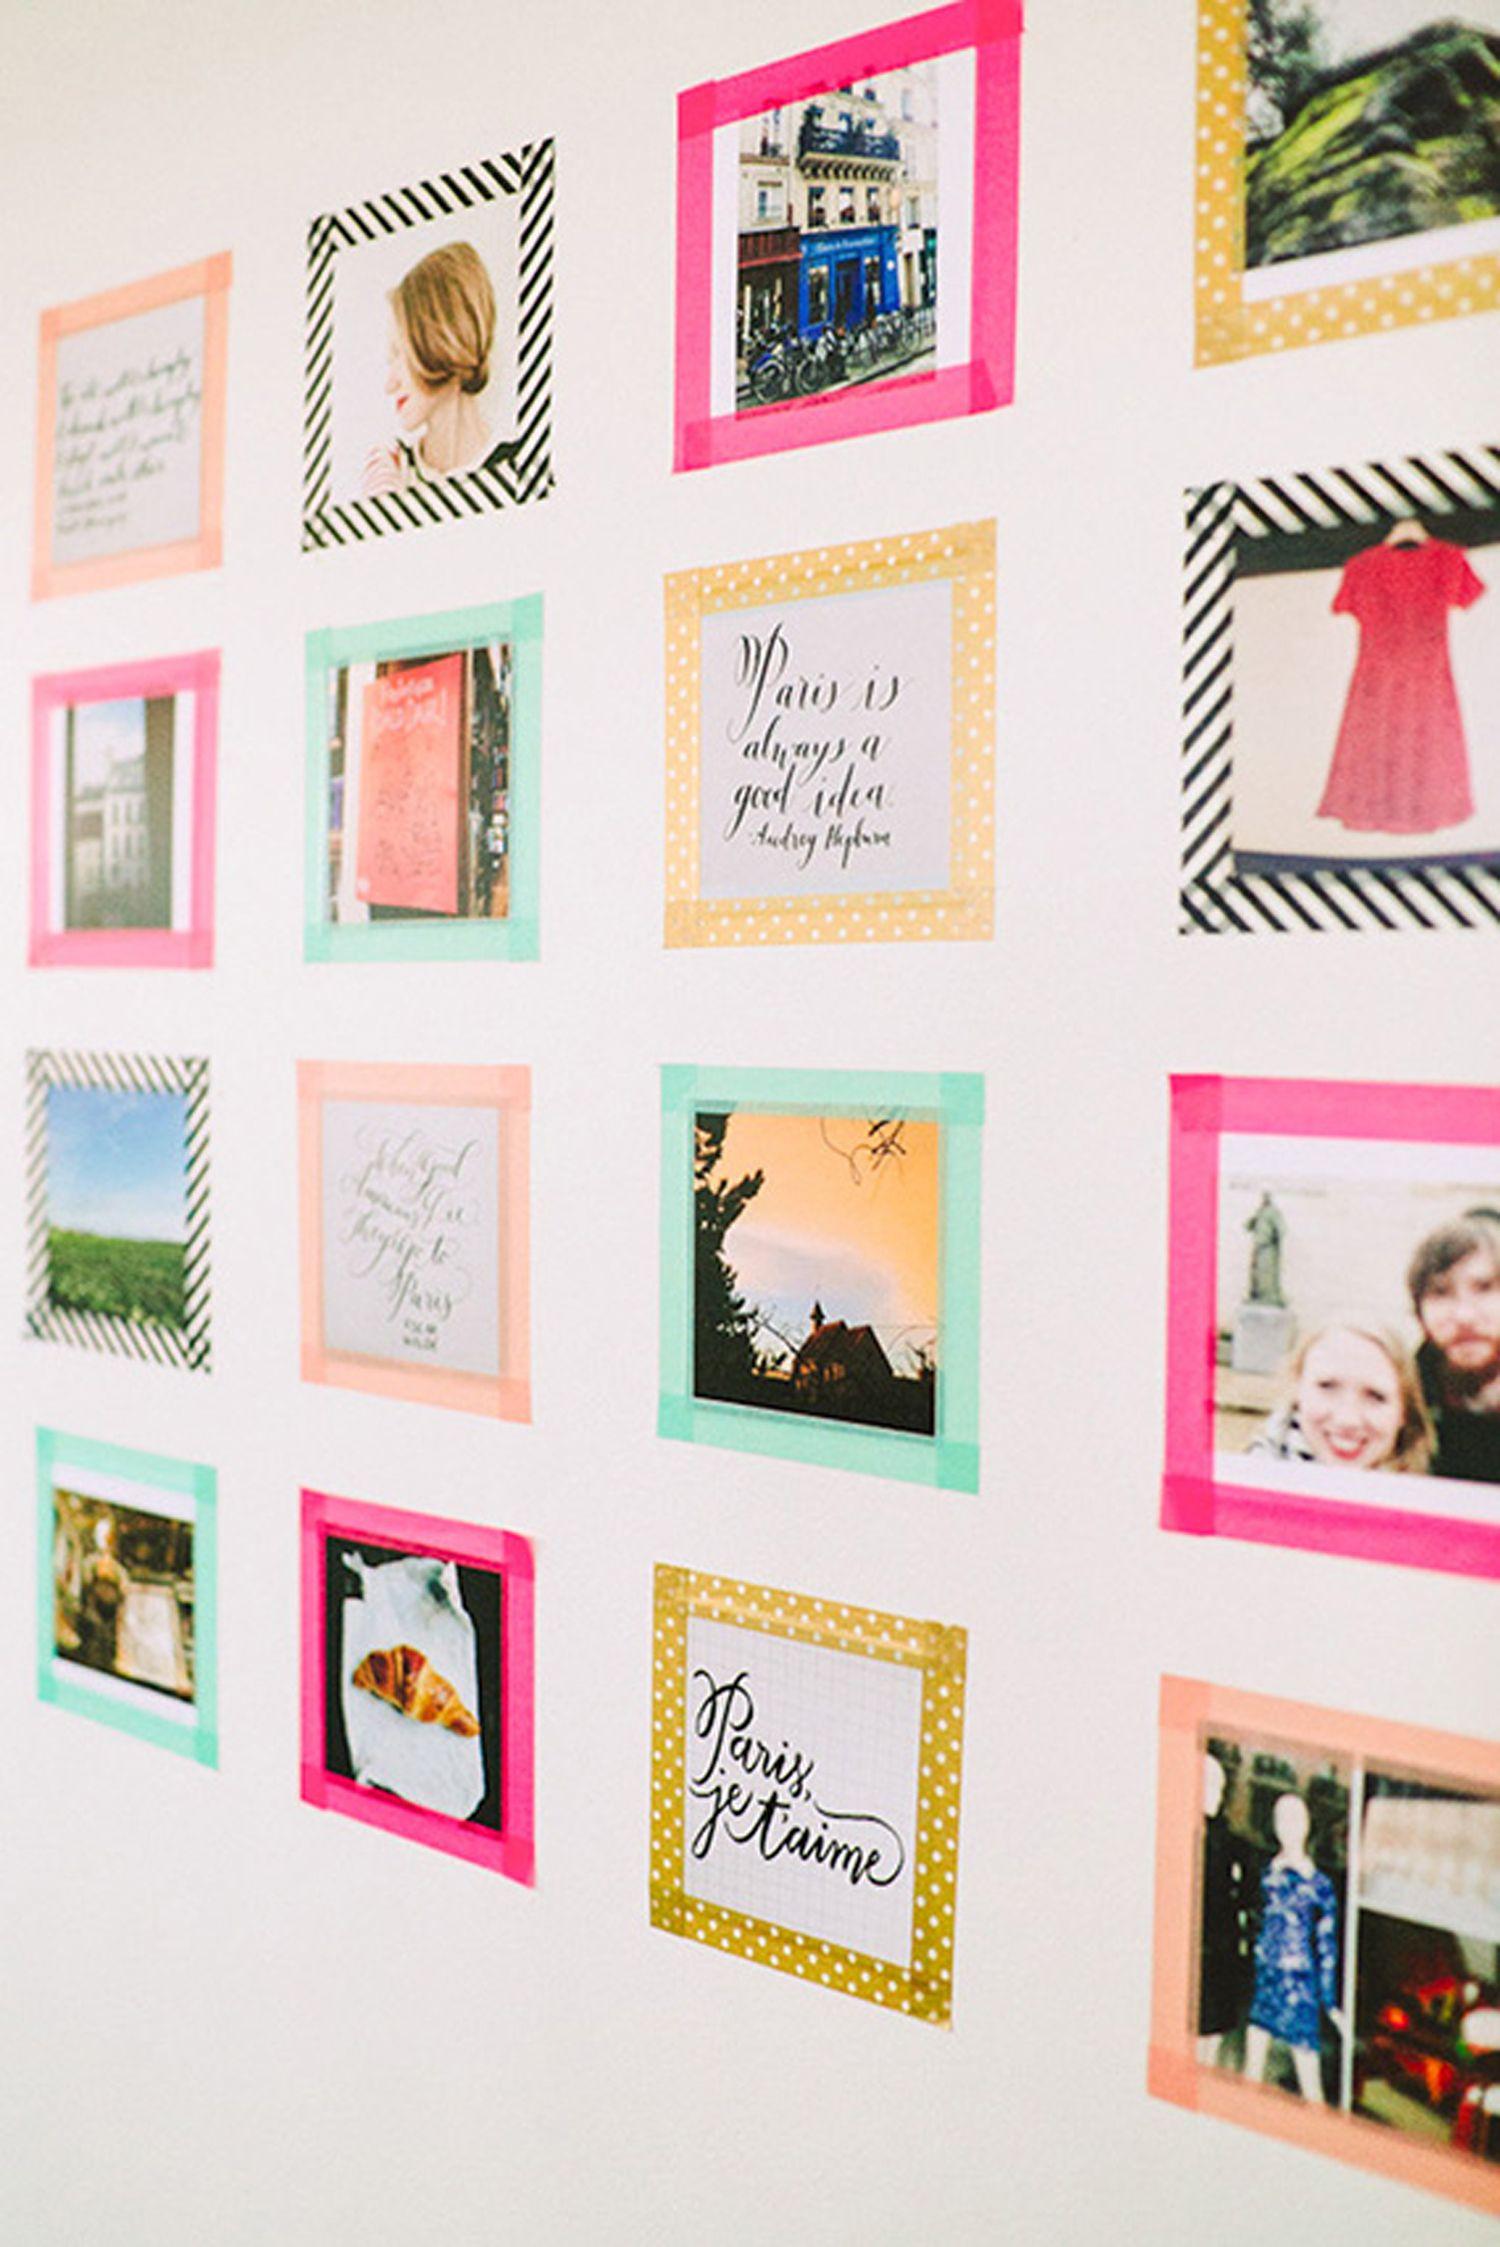 marco-de-fotos-con-washi | washi tape | Pinterest | Marcos de fotos ...